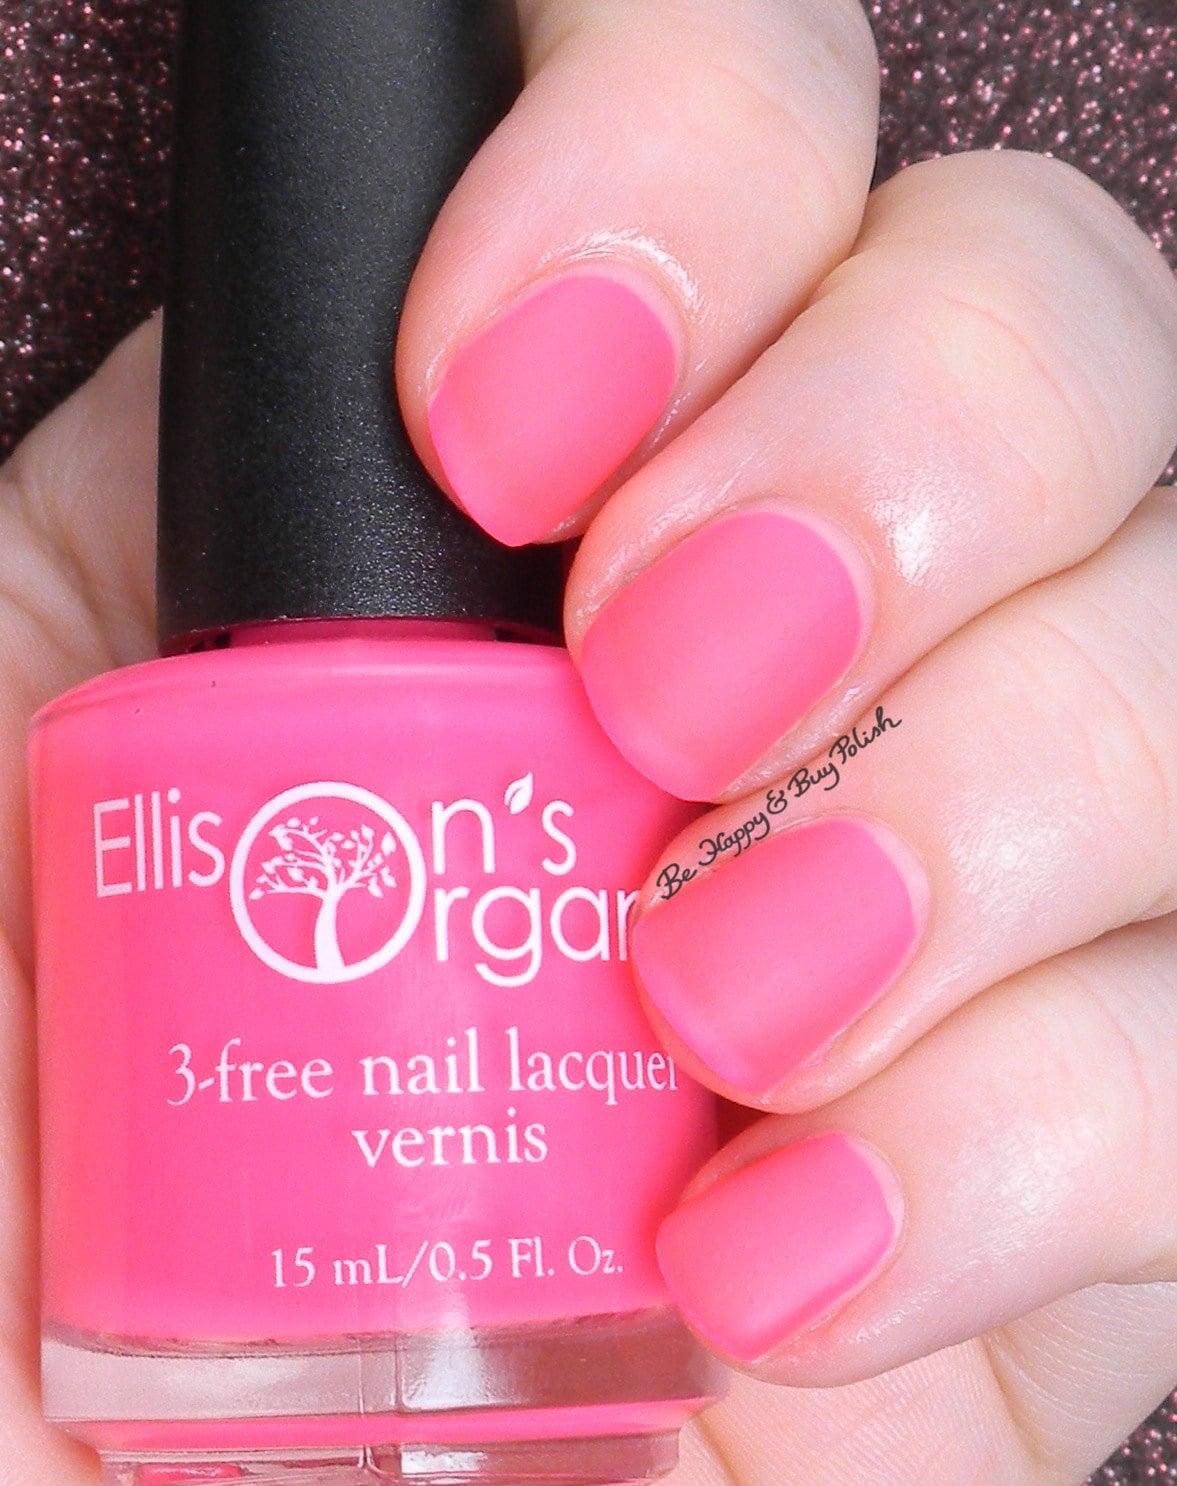 MATTE Neon Pink Nail Polish - Glow in the Dark Nail Polish - Matte ...